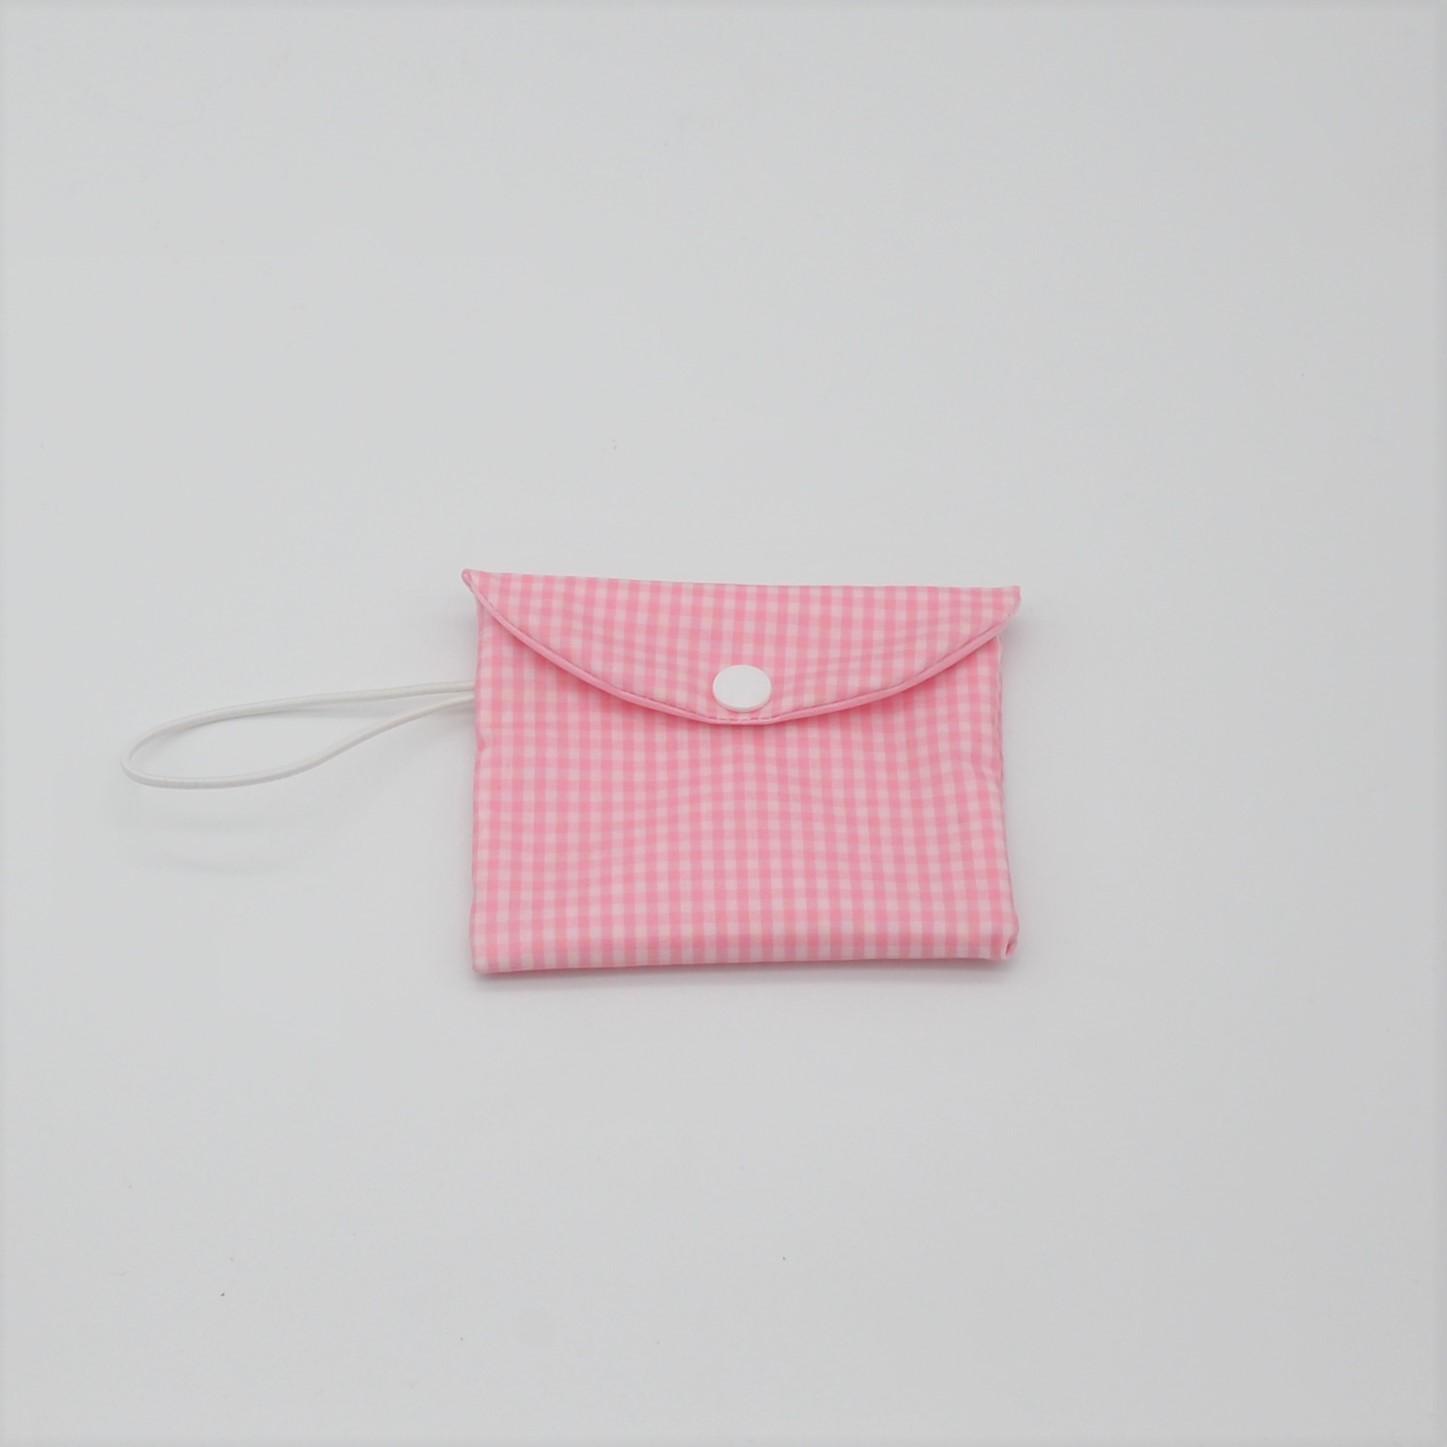 Etui imperméable savon motif vichy rose--9995825791947